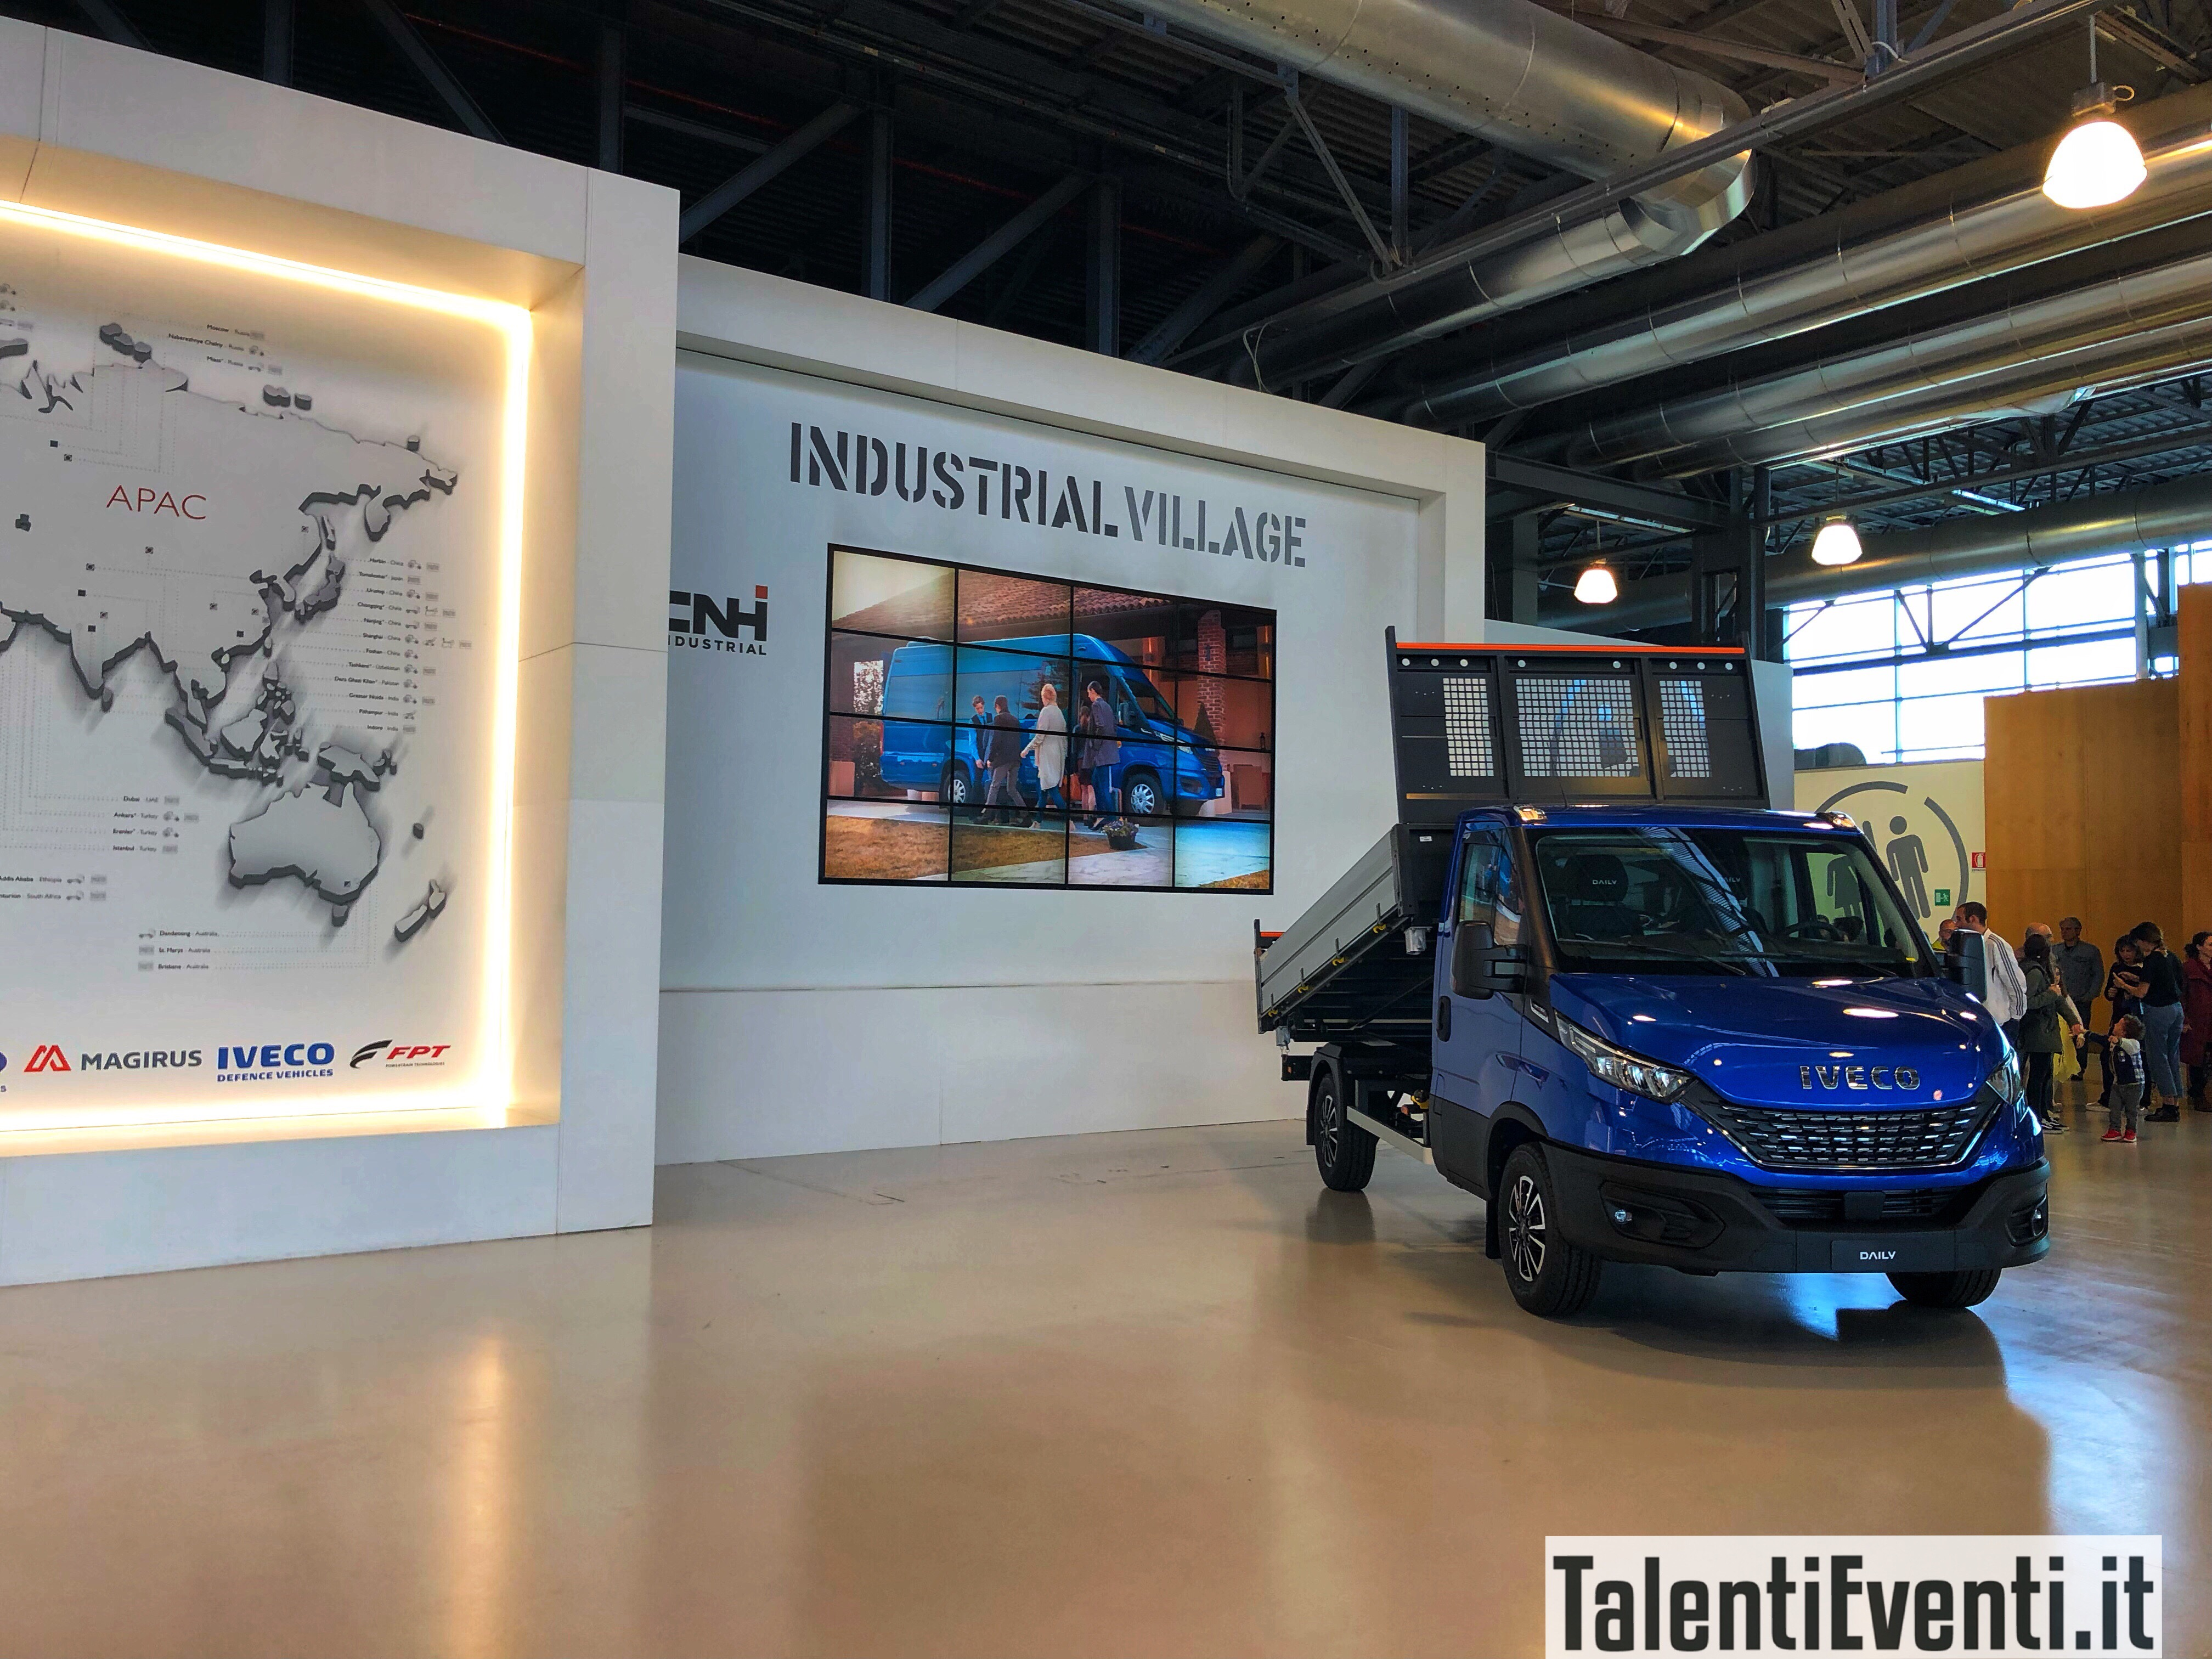 talenti_eventi_cnh_industrial_village_14